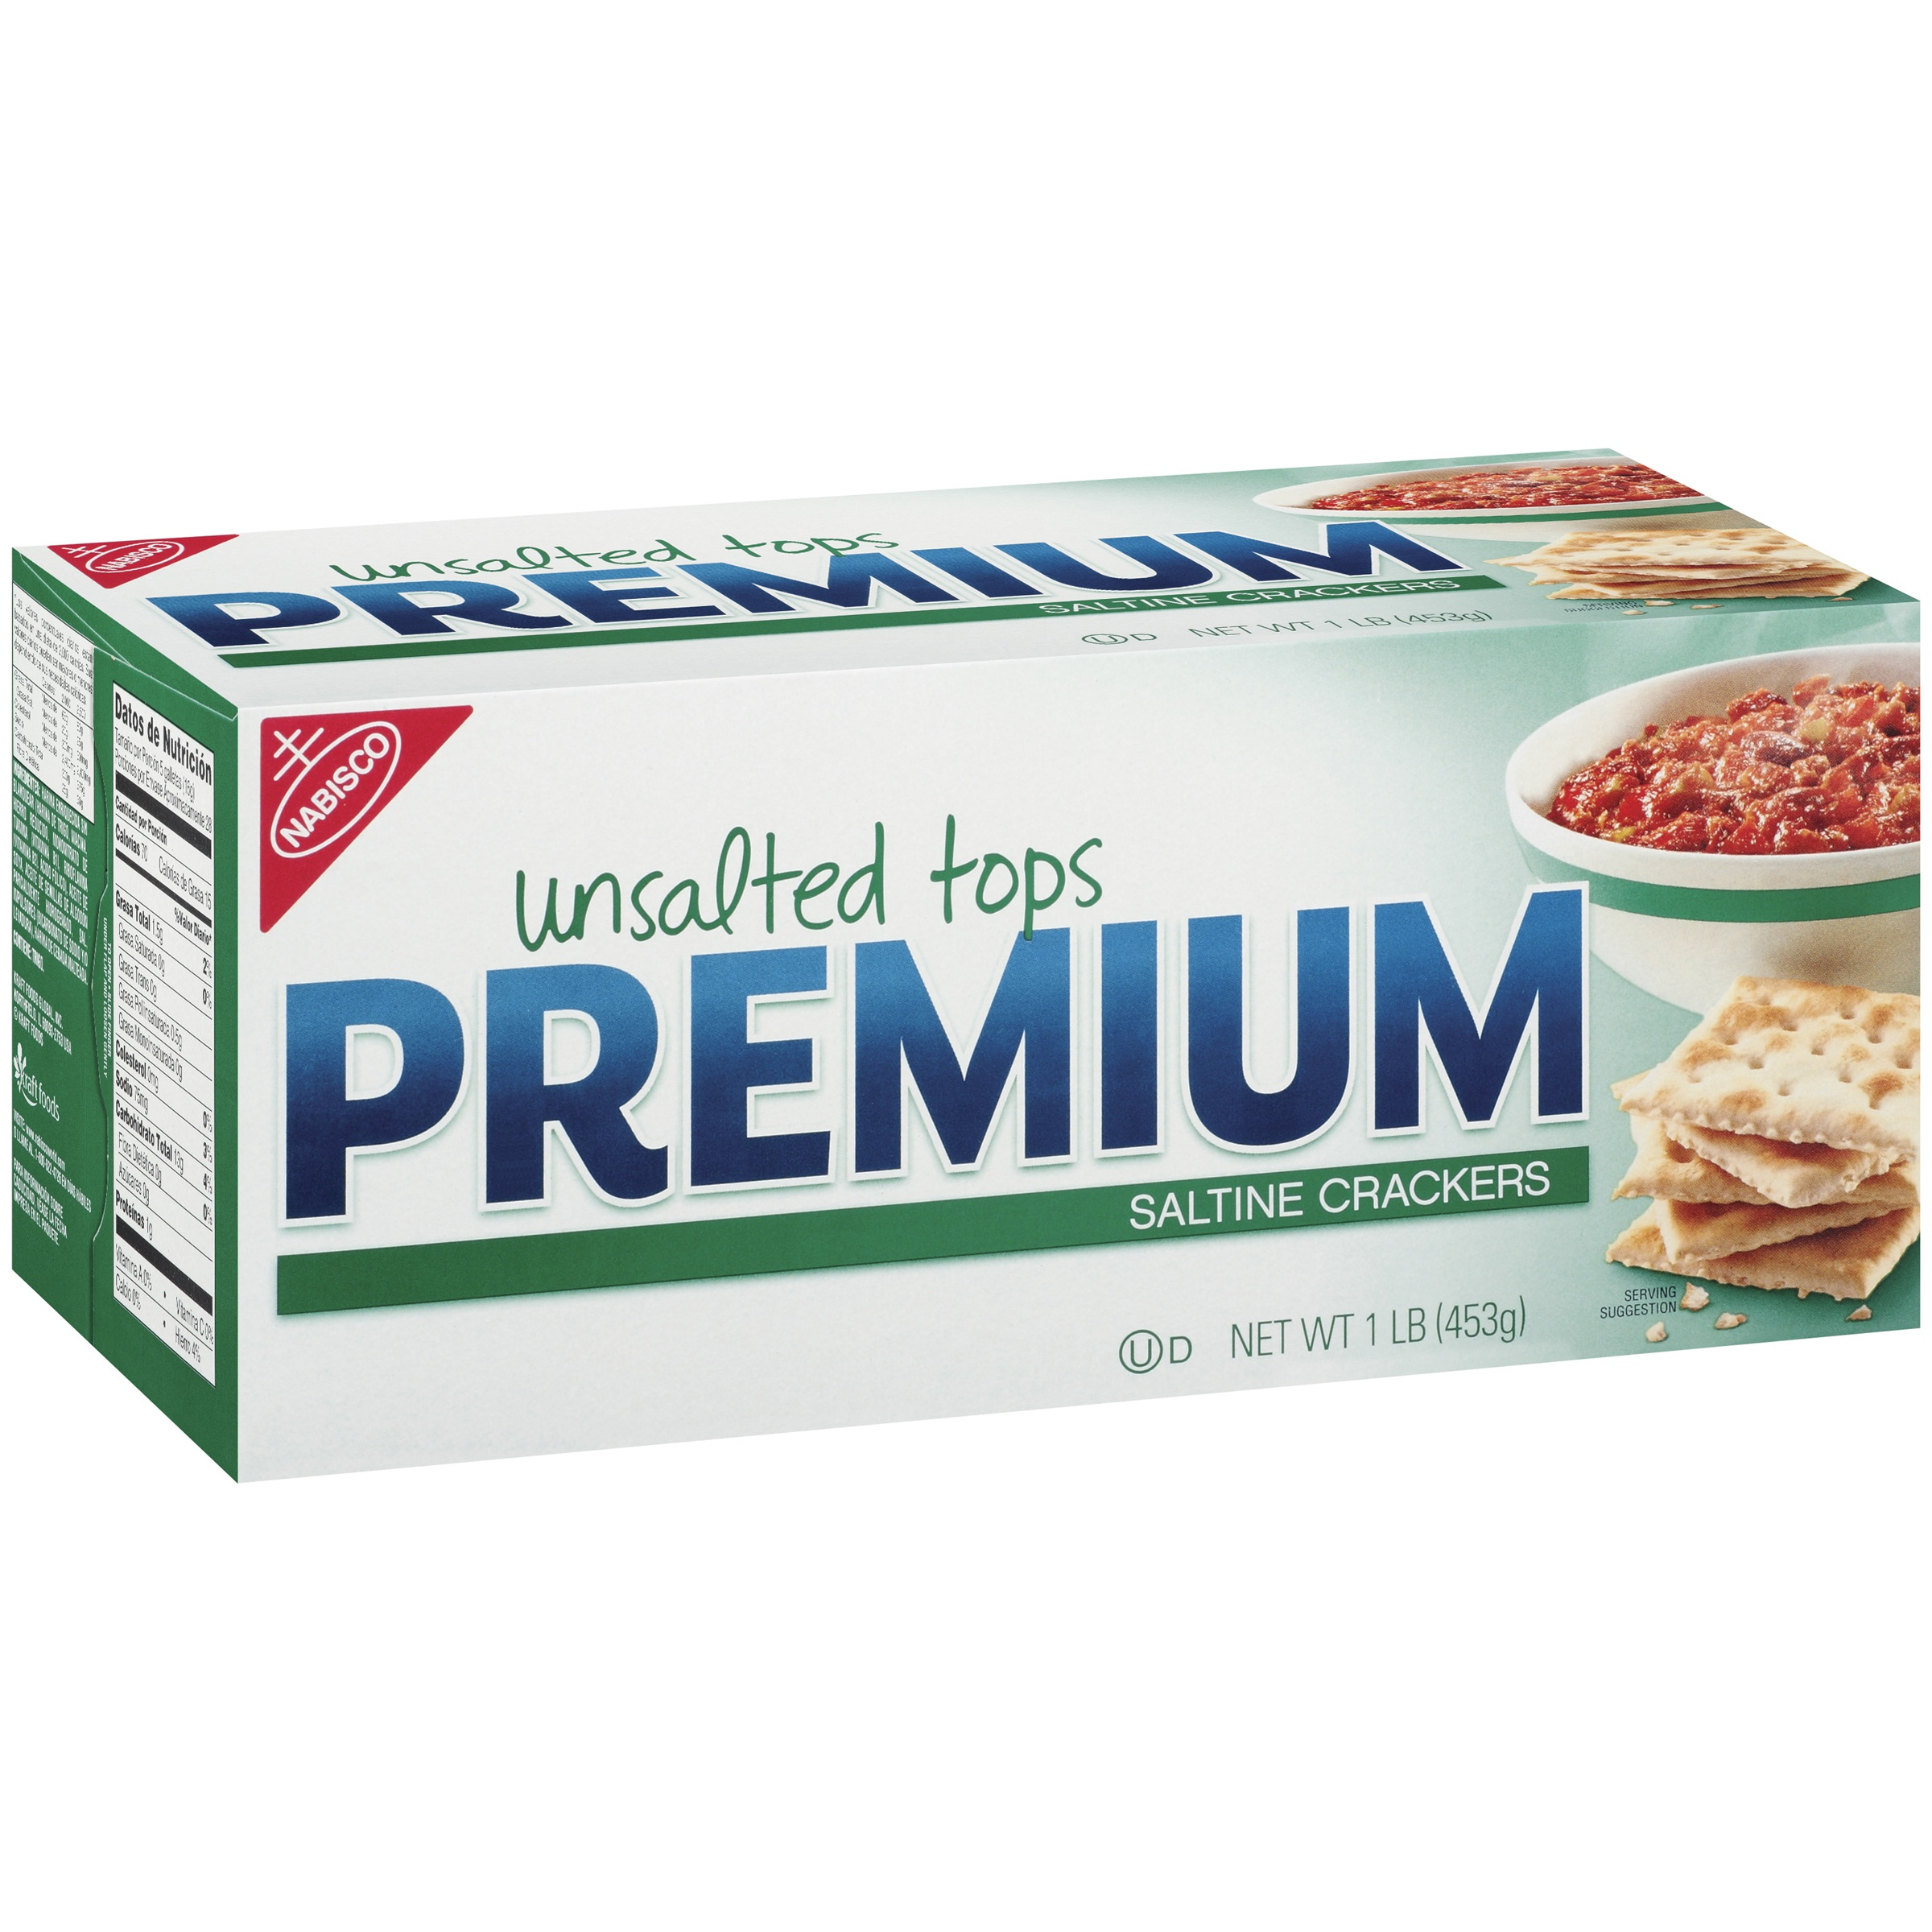 Premium Saltine Crackers Unsalted Tops, 1.0 LB